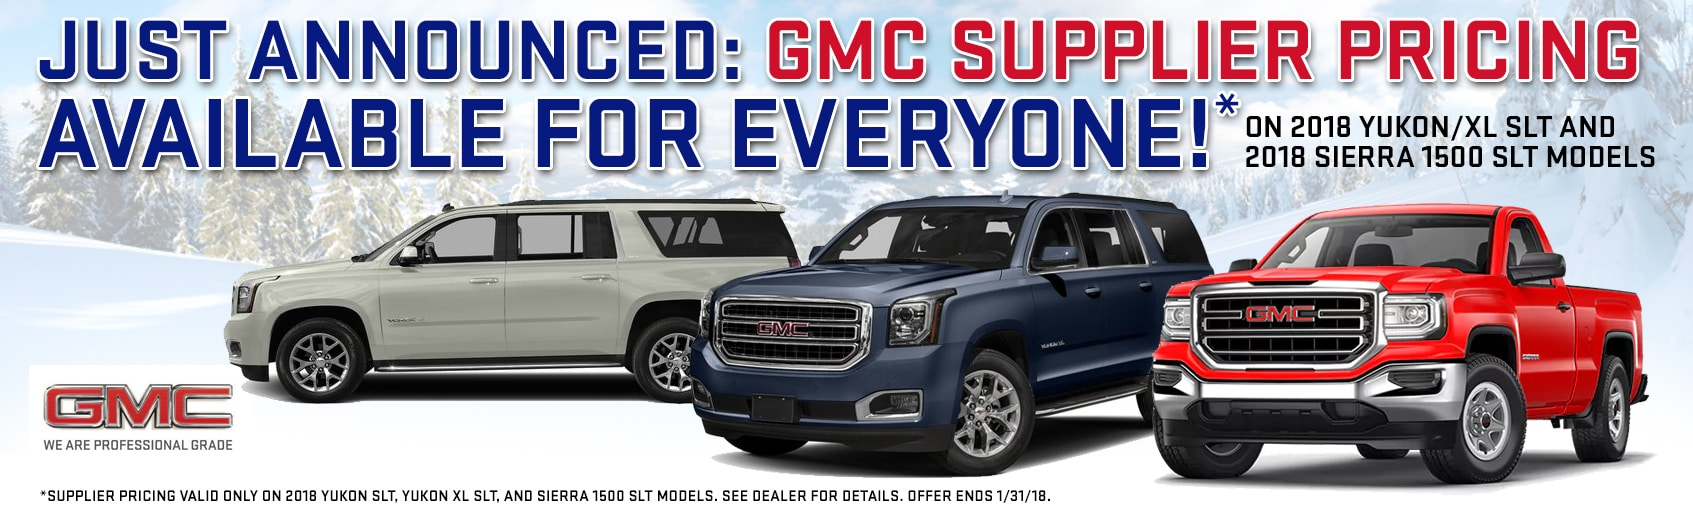 Chevy Dealership Fayetteville Nc >> Flow Chevrolet Buick GMC of Winston Salem   New Buick, Chevrolet, GMC dealership in Winston ...